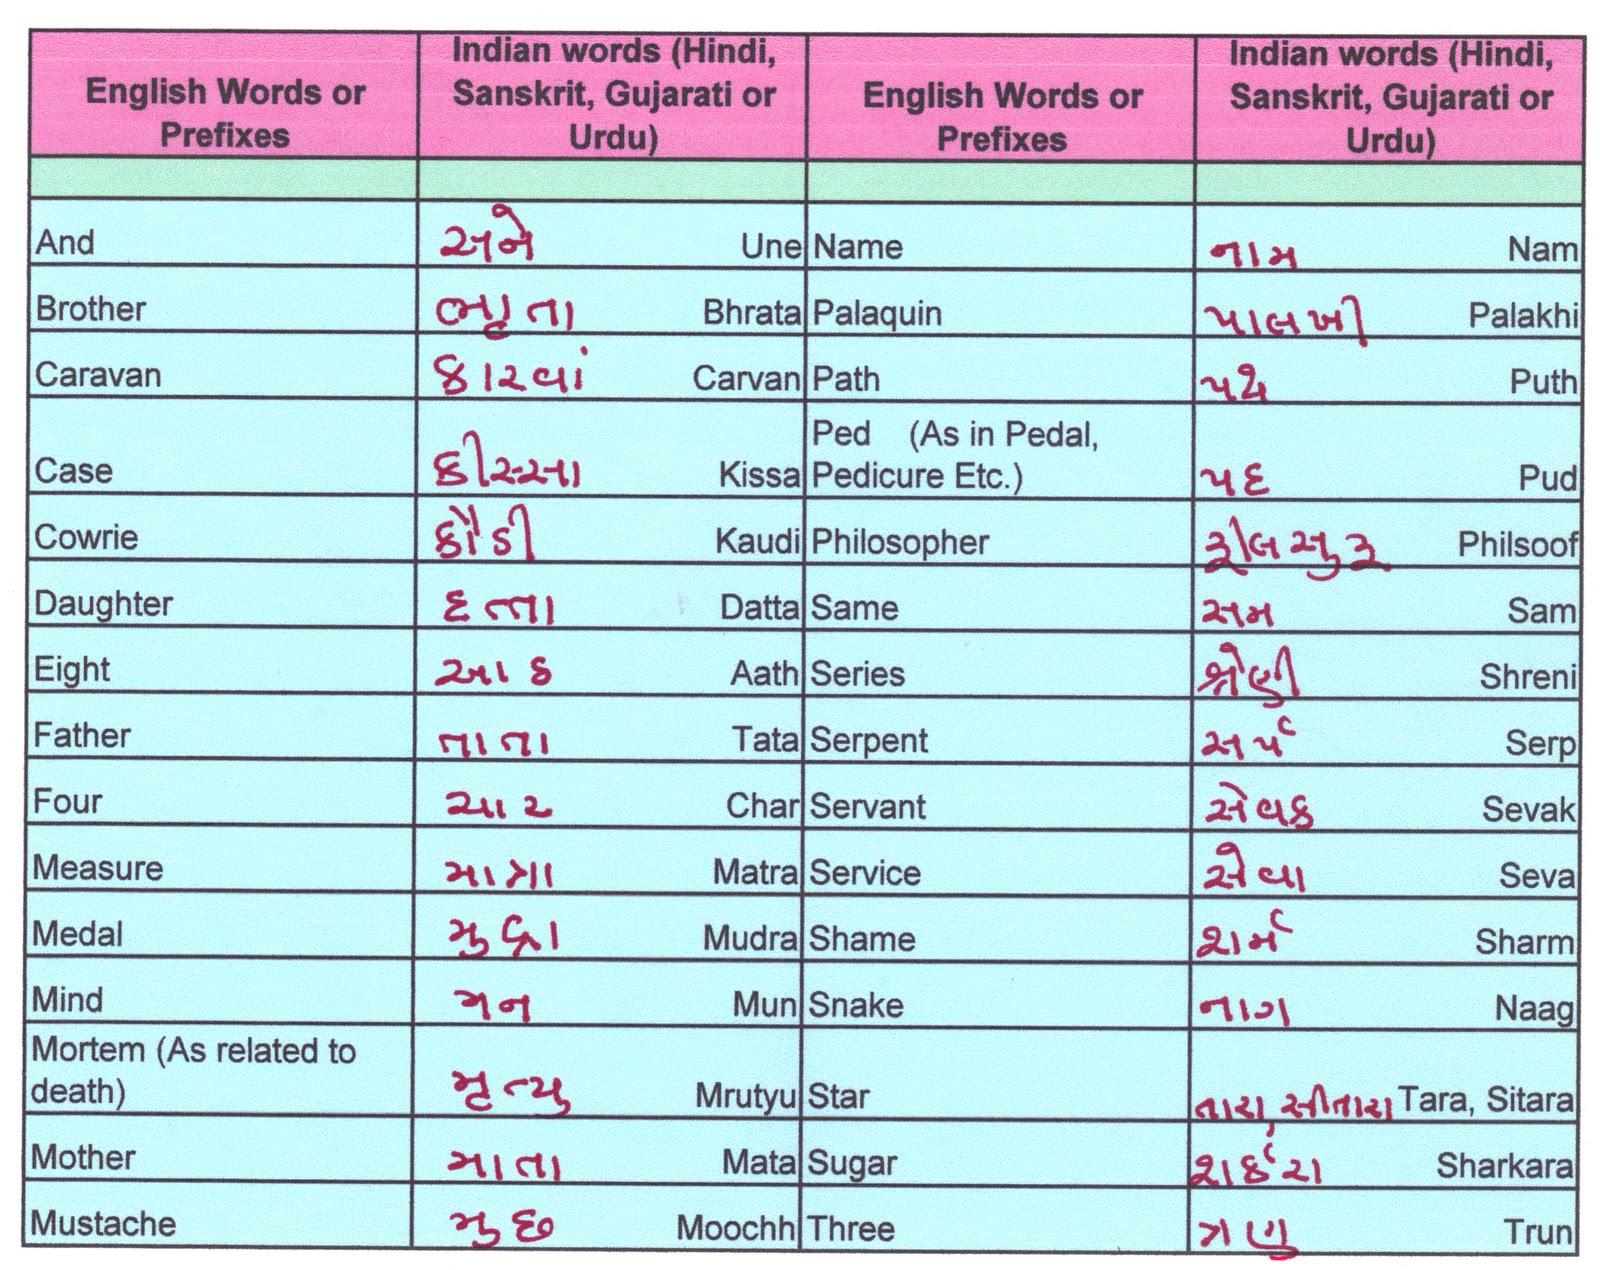 Charu Gandhi English Language